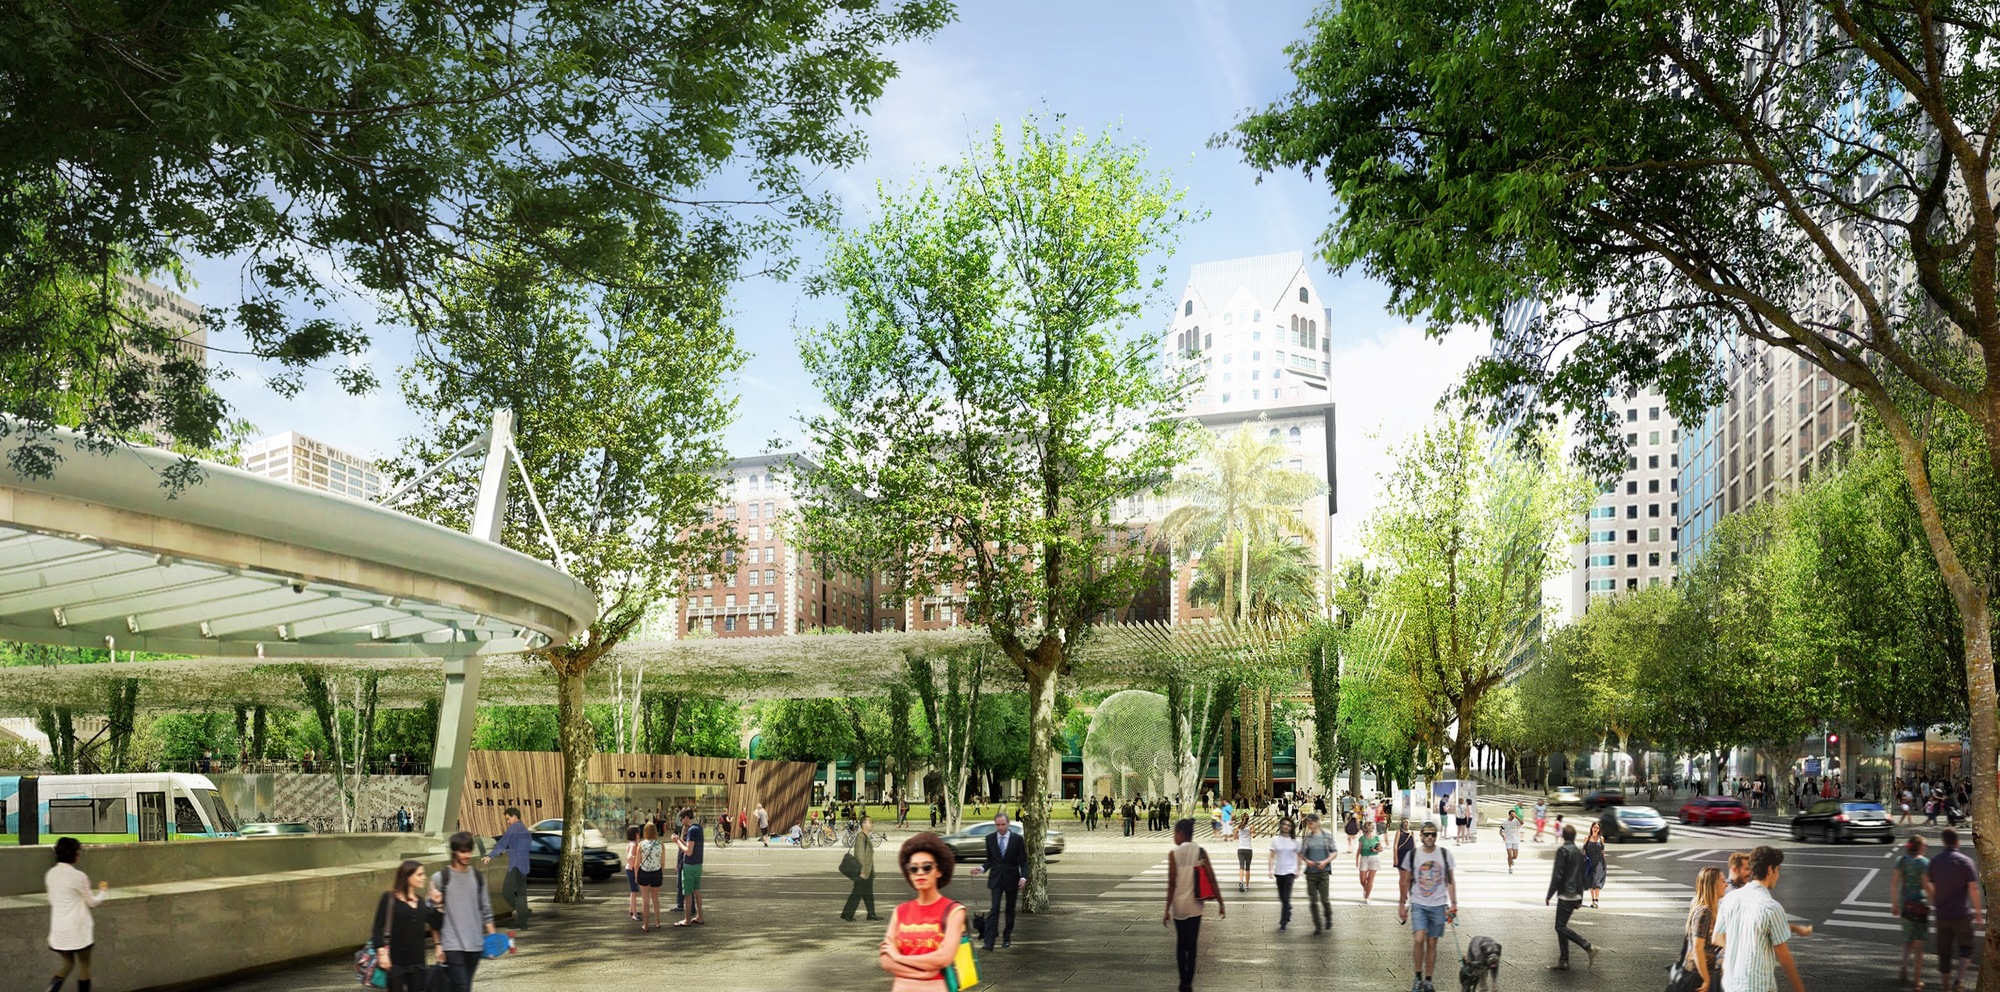 Best Landscape Design Schools